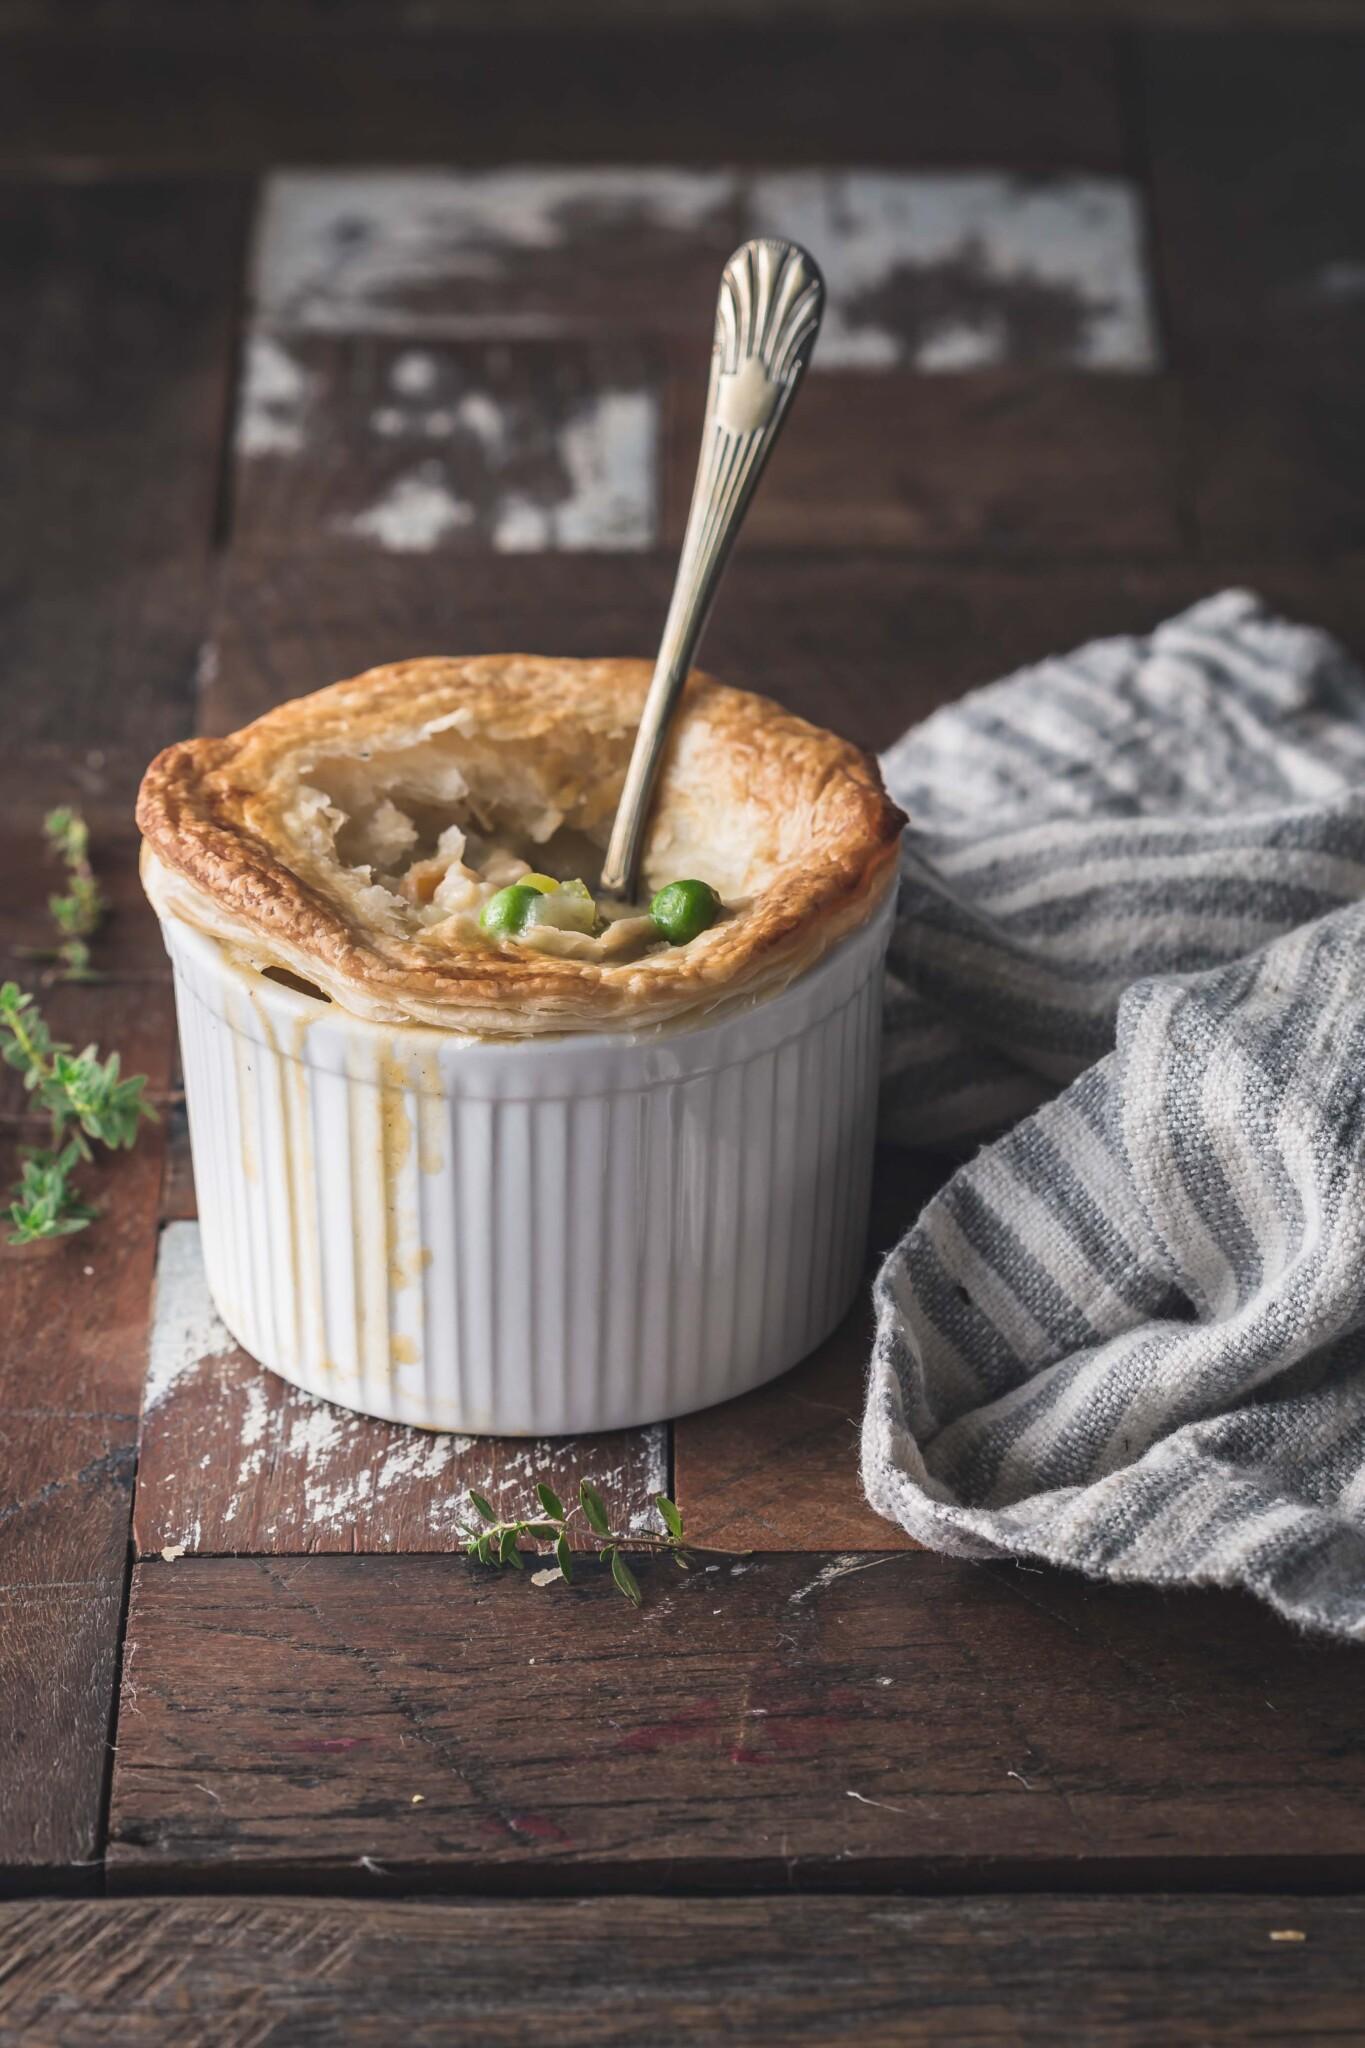 A vegan pot pie in a ramekin sitting on a wooden bench